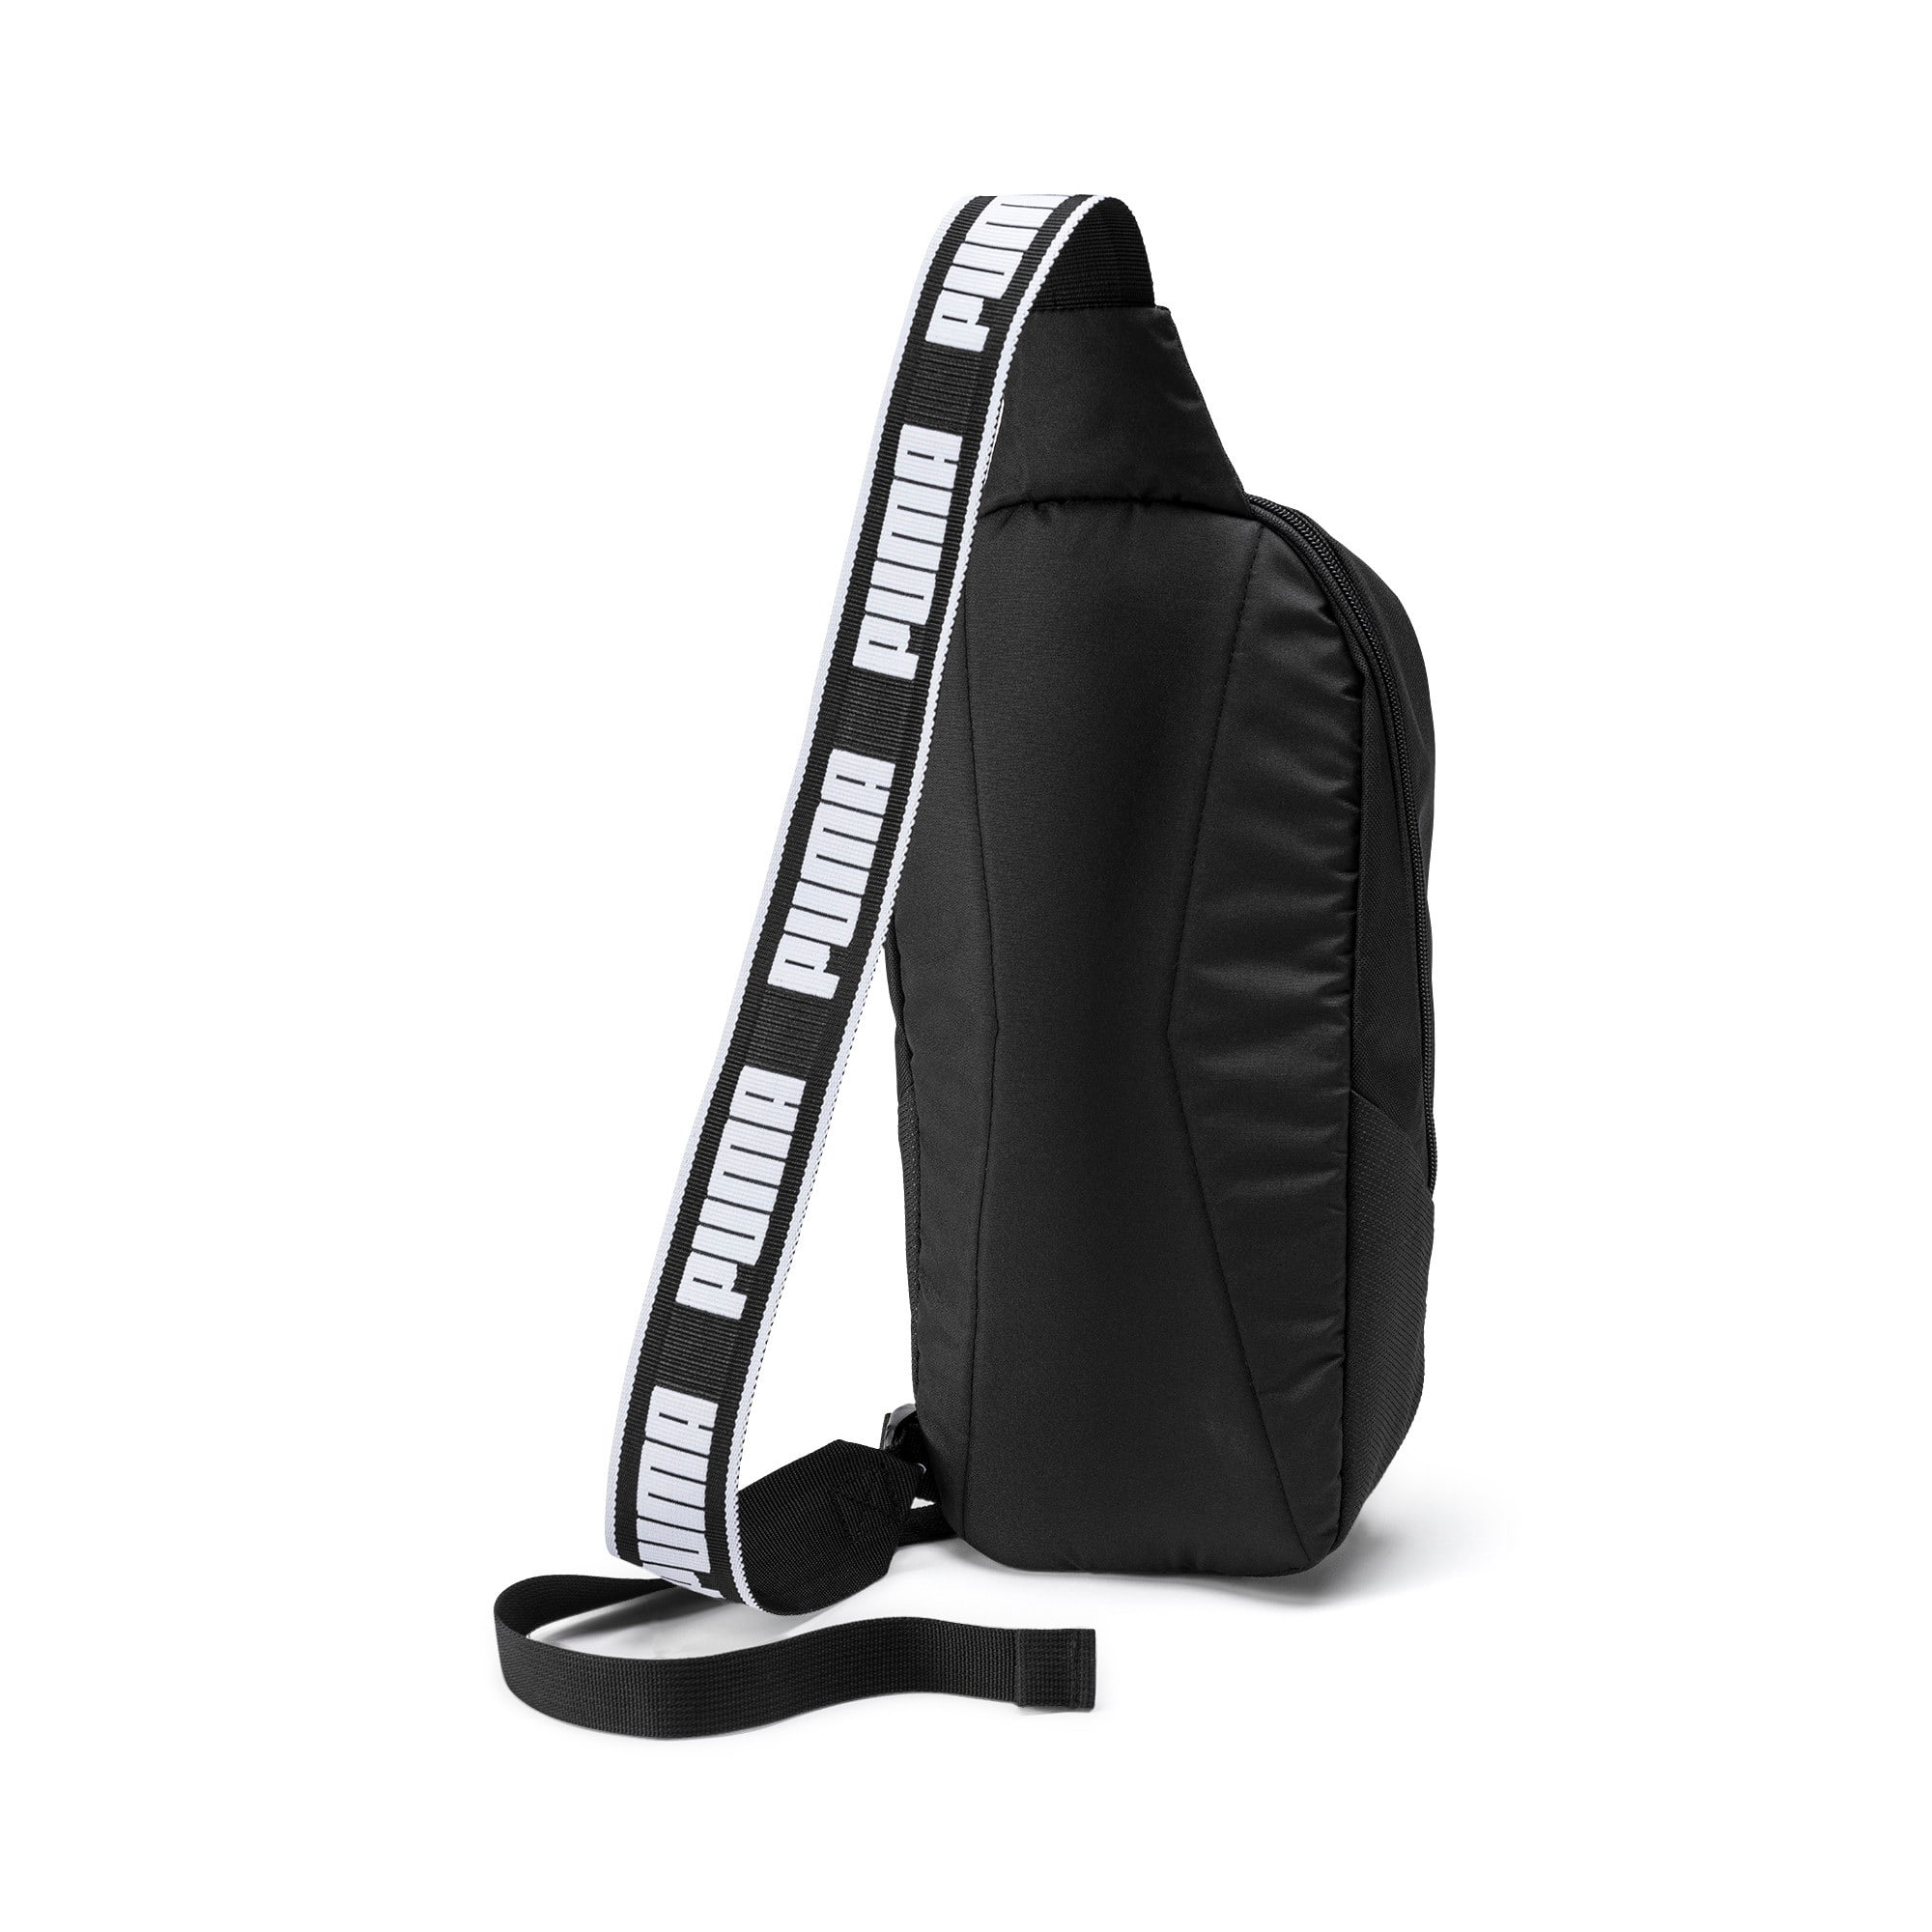 Thumbnail 2 of Sole X-body Bag, Puma Black, medium